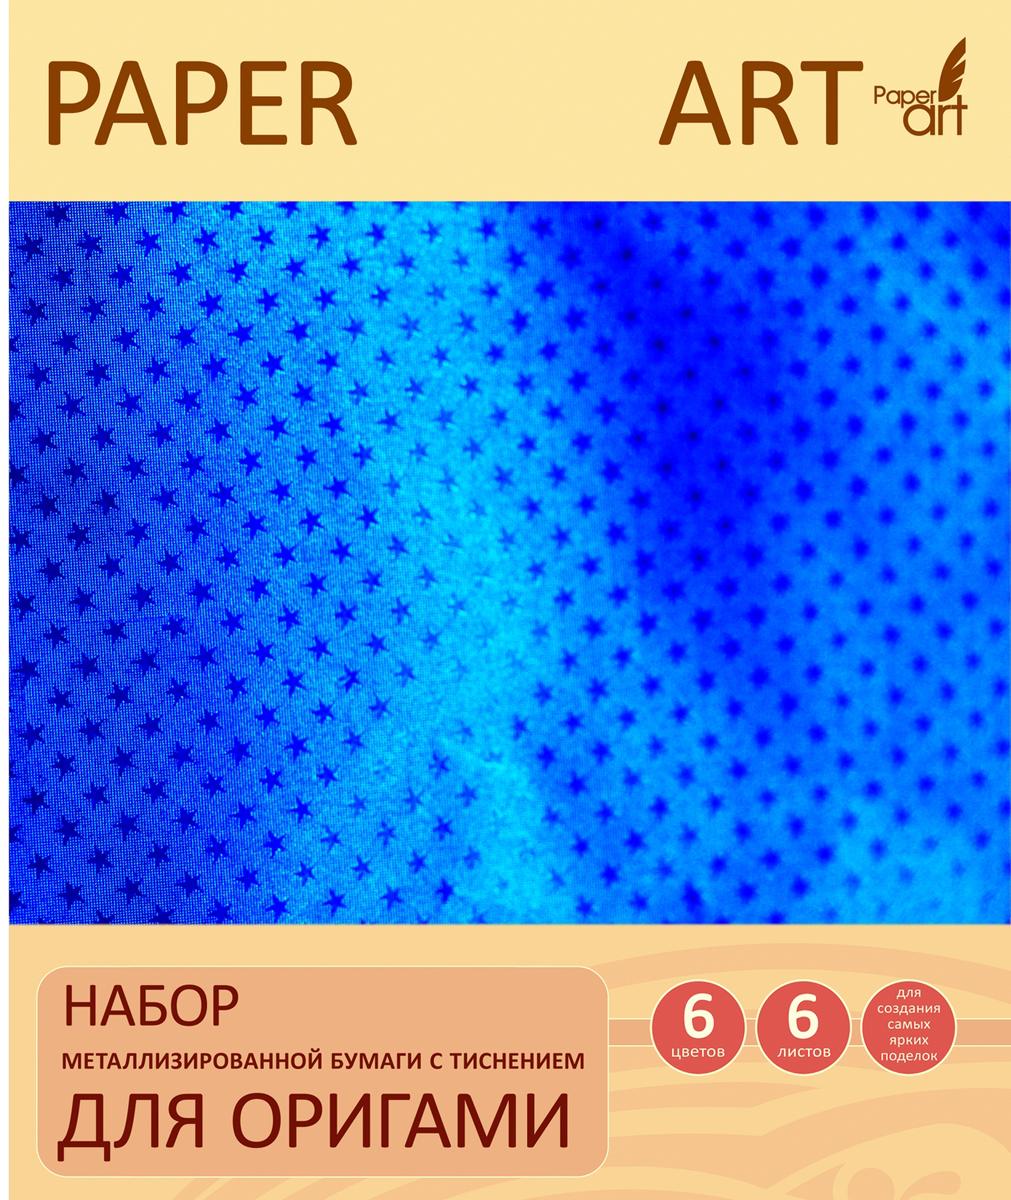 Paper Art Бумага цветная Переливы цвета металлизированная 6 листов ЦБМО66262 silwerhof цветная бумага металлизированная shine flyers 5 листов 5 цветов